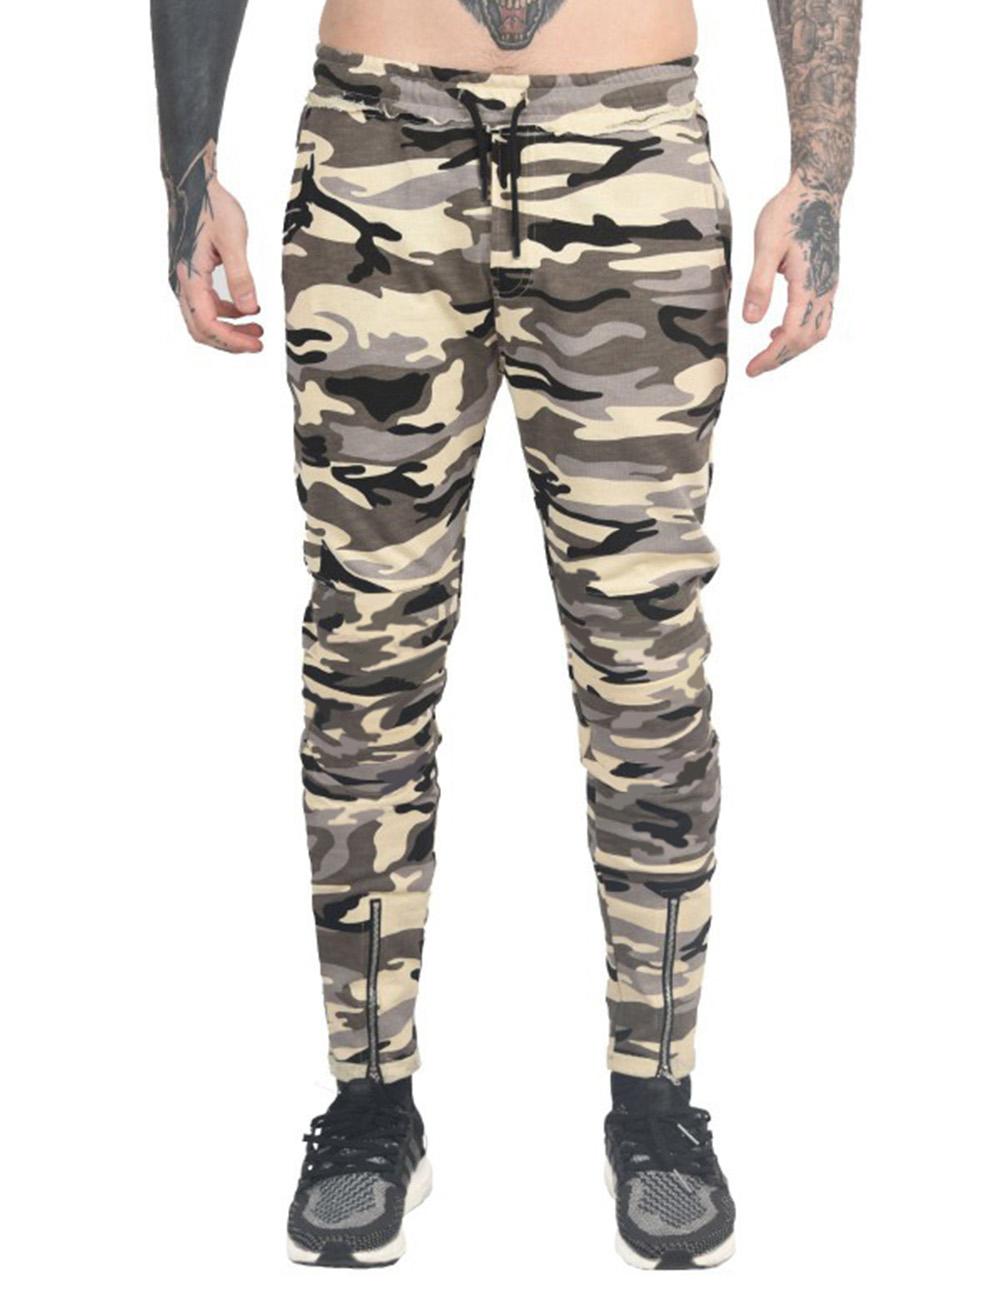 Stylish Men Camouflage Sports Trousers with Zipper Leg Opening Elastic Band Waist Long Pants Gift Yellow Camo_XL